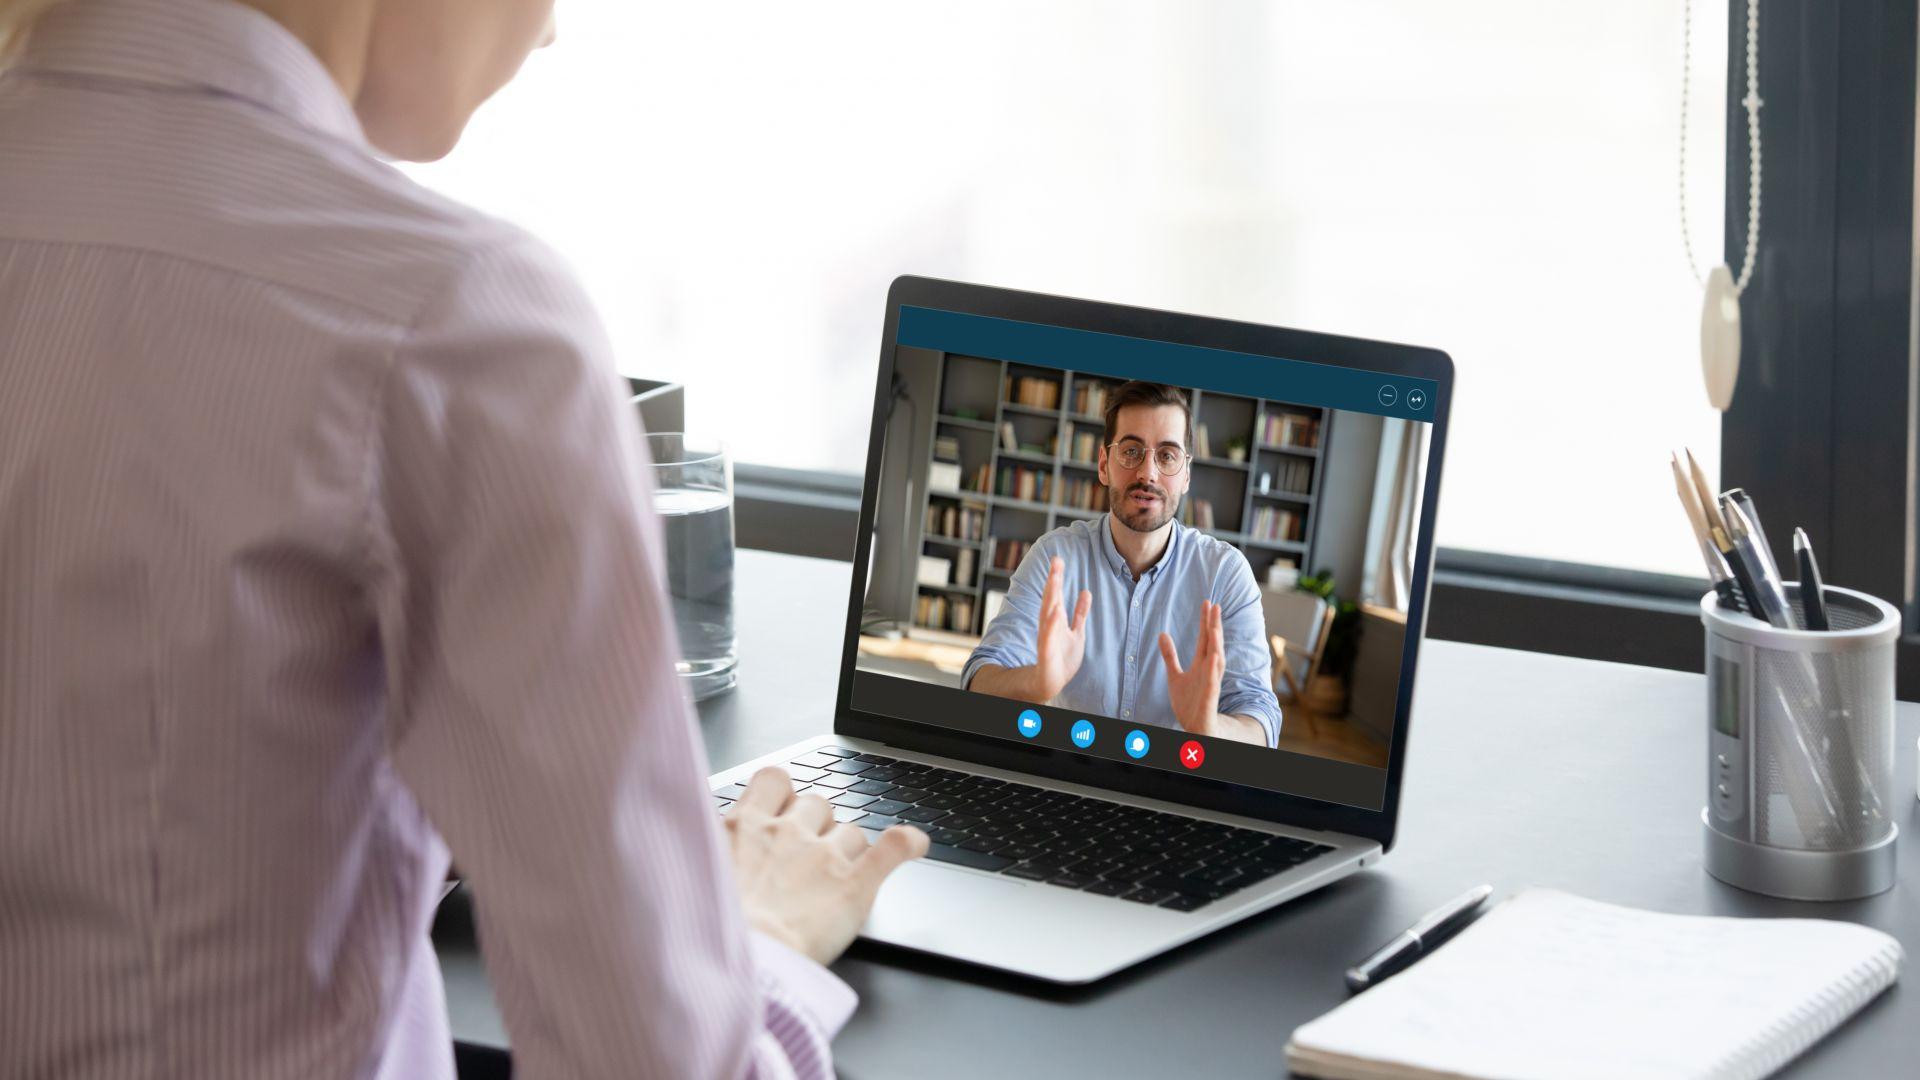 «VISIO SYNDIC», la solution d'organisation des AG de la FNAIM en partenariat avec Media Communication IDF